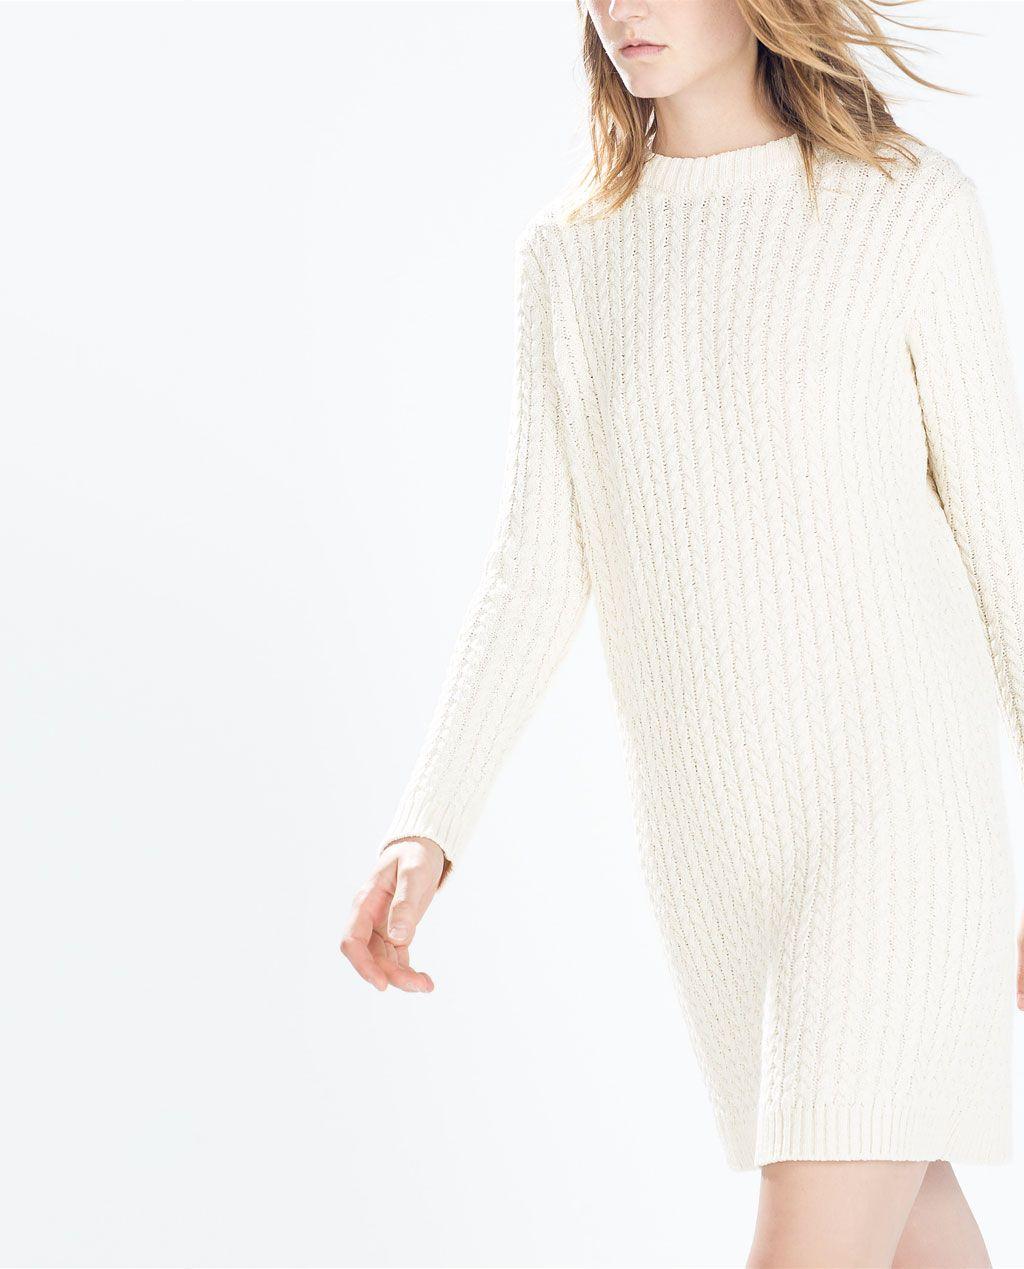 Zara long sweater dress